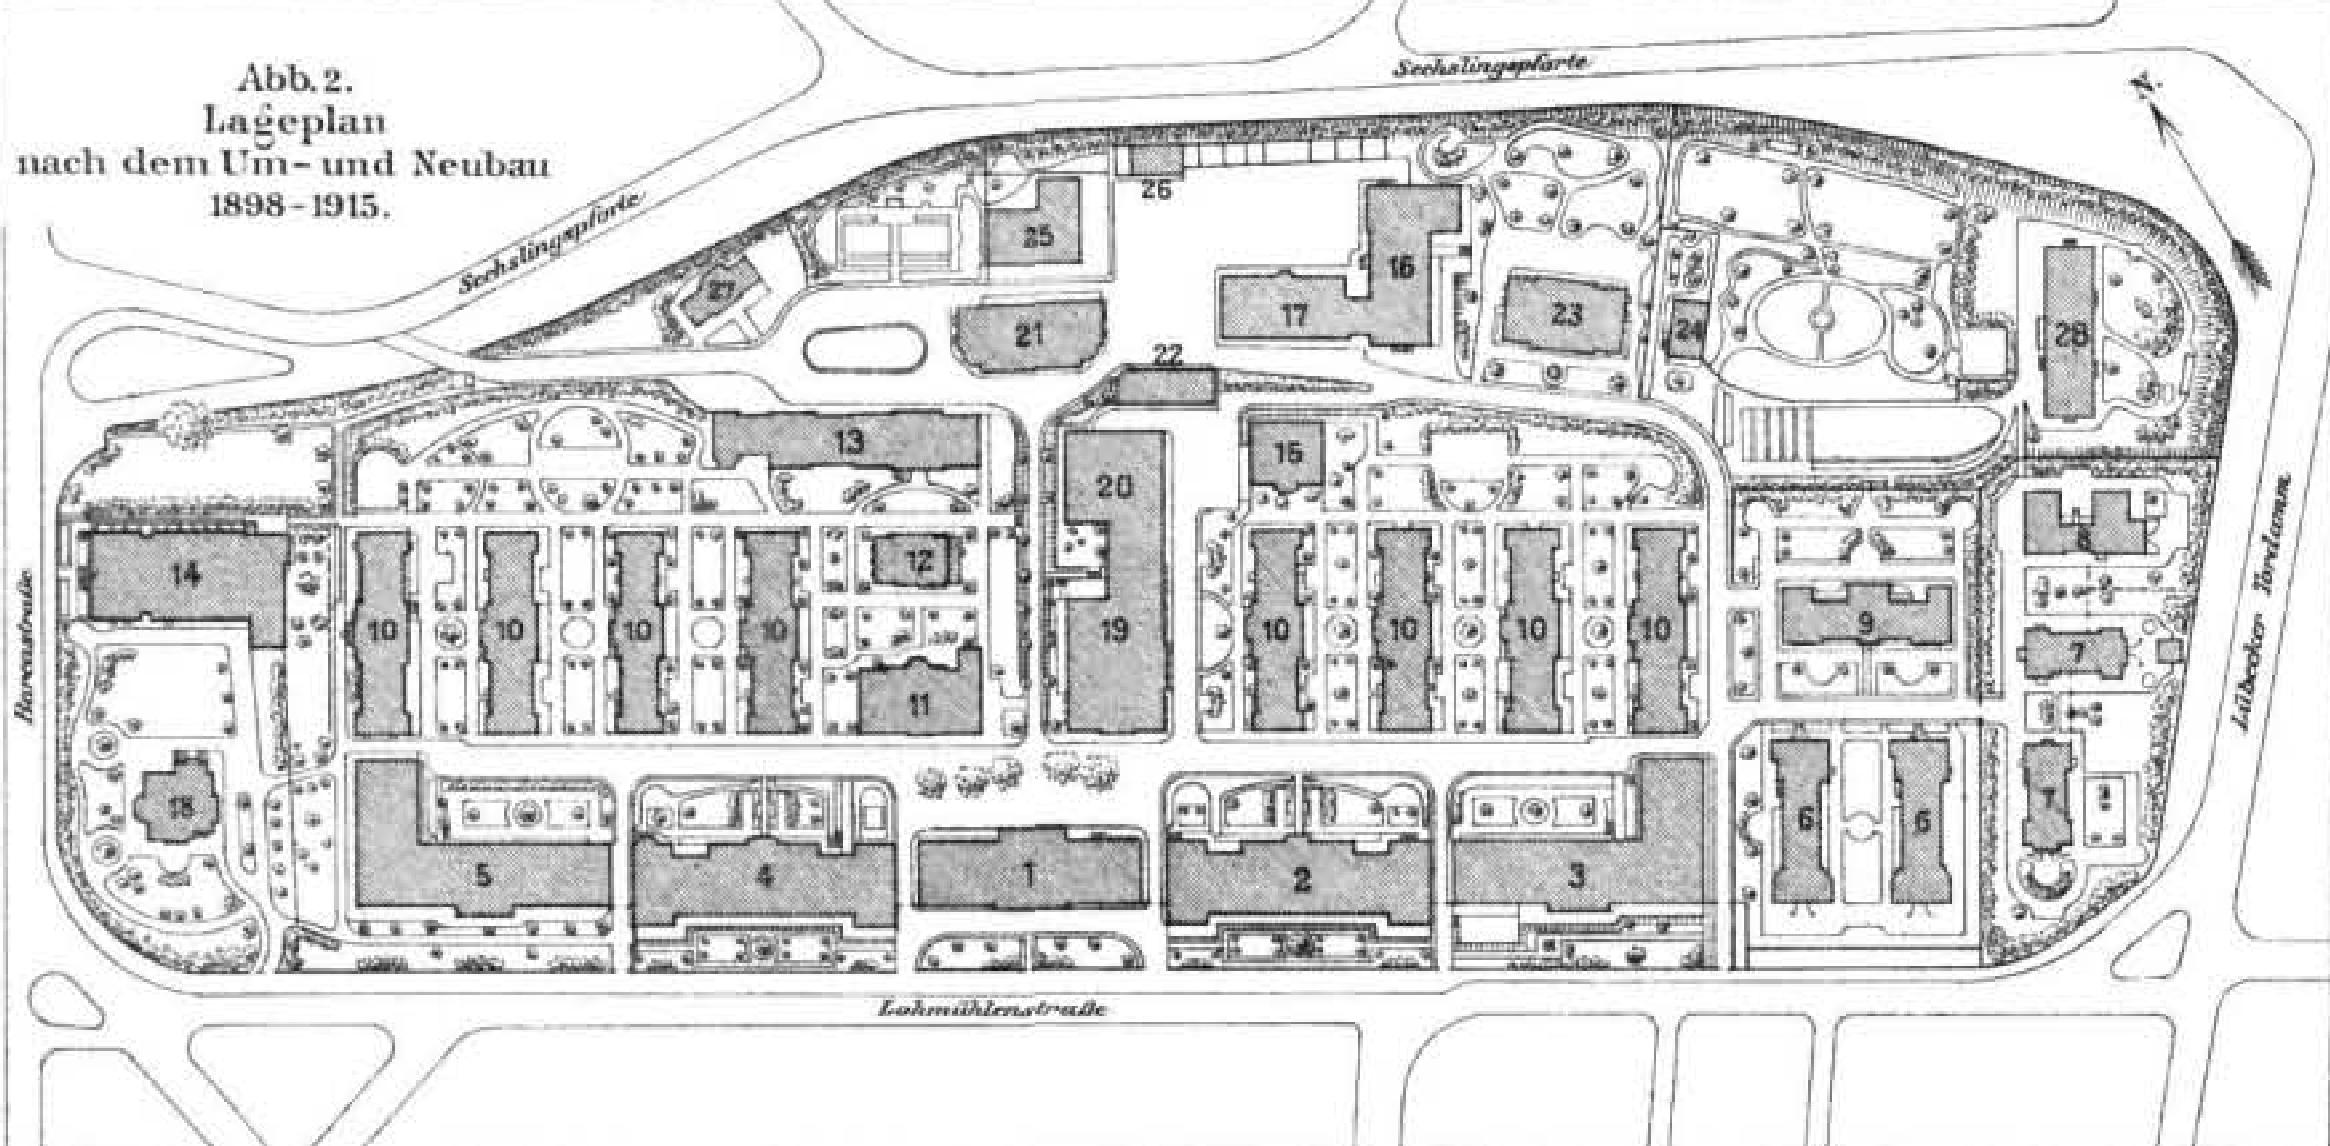 datei krankenhaus st georg nach dem umbau 1915 lageplan zfb 1917 png wikipedia. Black Bedroom Furniture Sets. Home Design Ideas